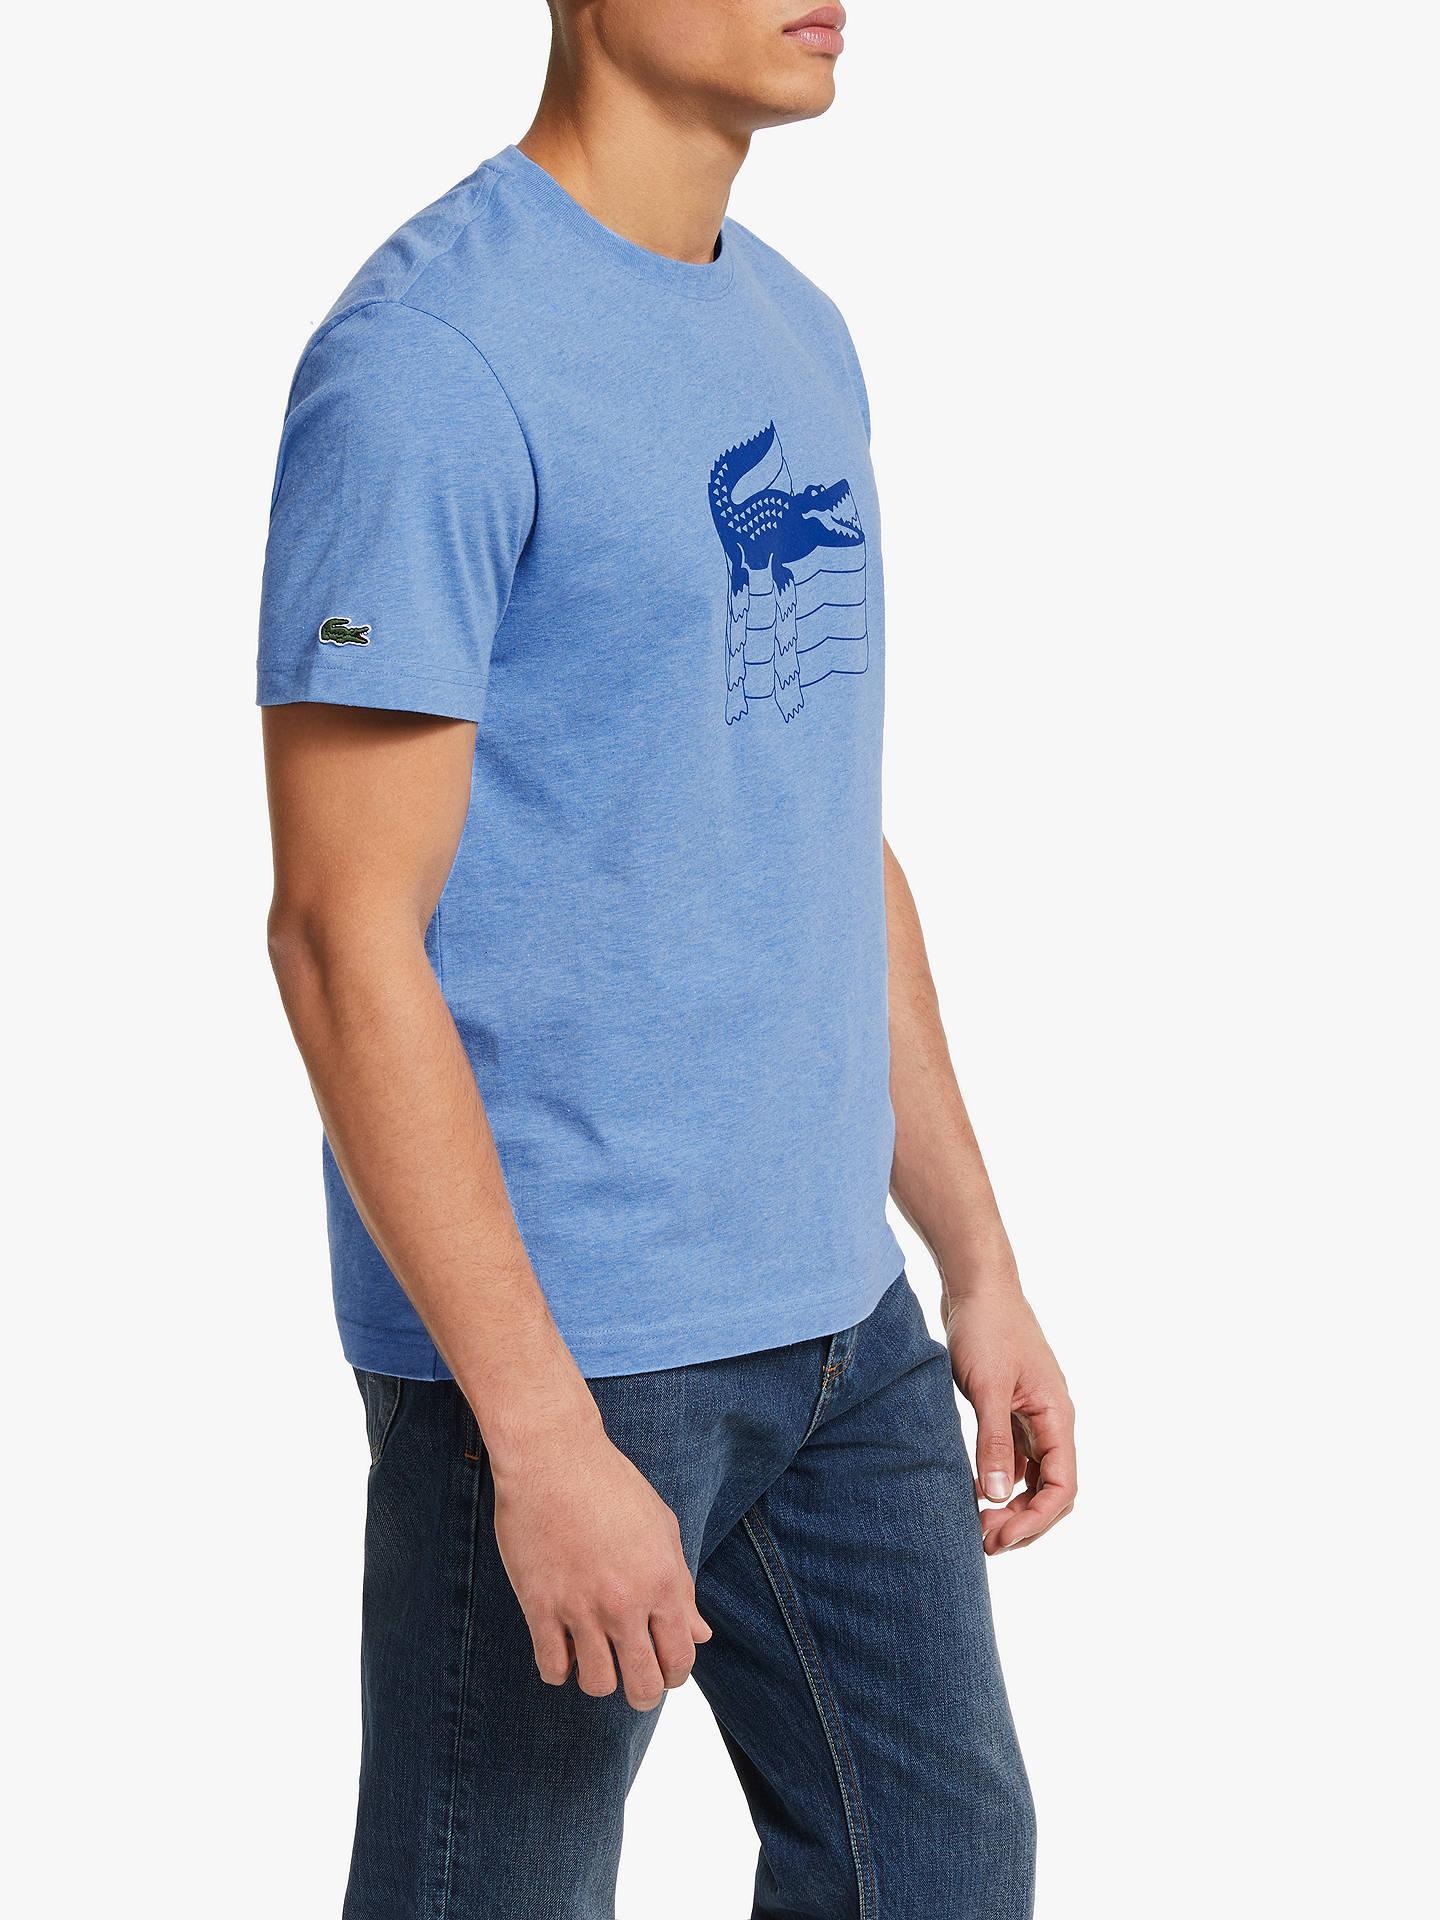 914b98bcbfb Buy Lacoste Short Sleeve Logo T-Shirt